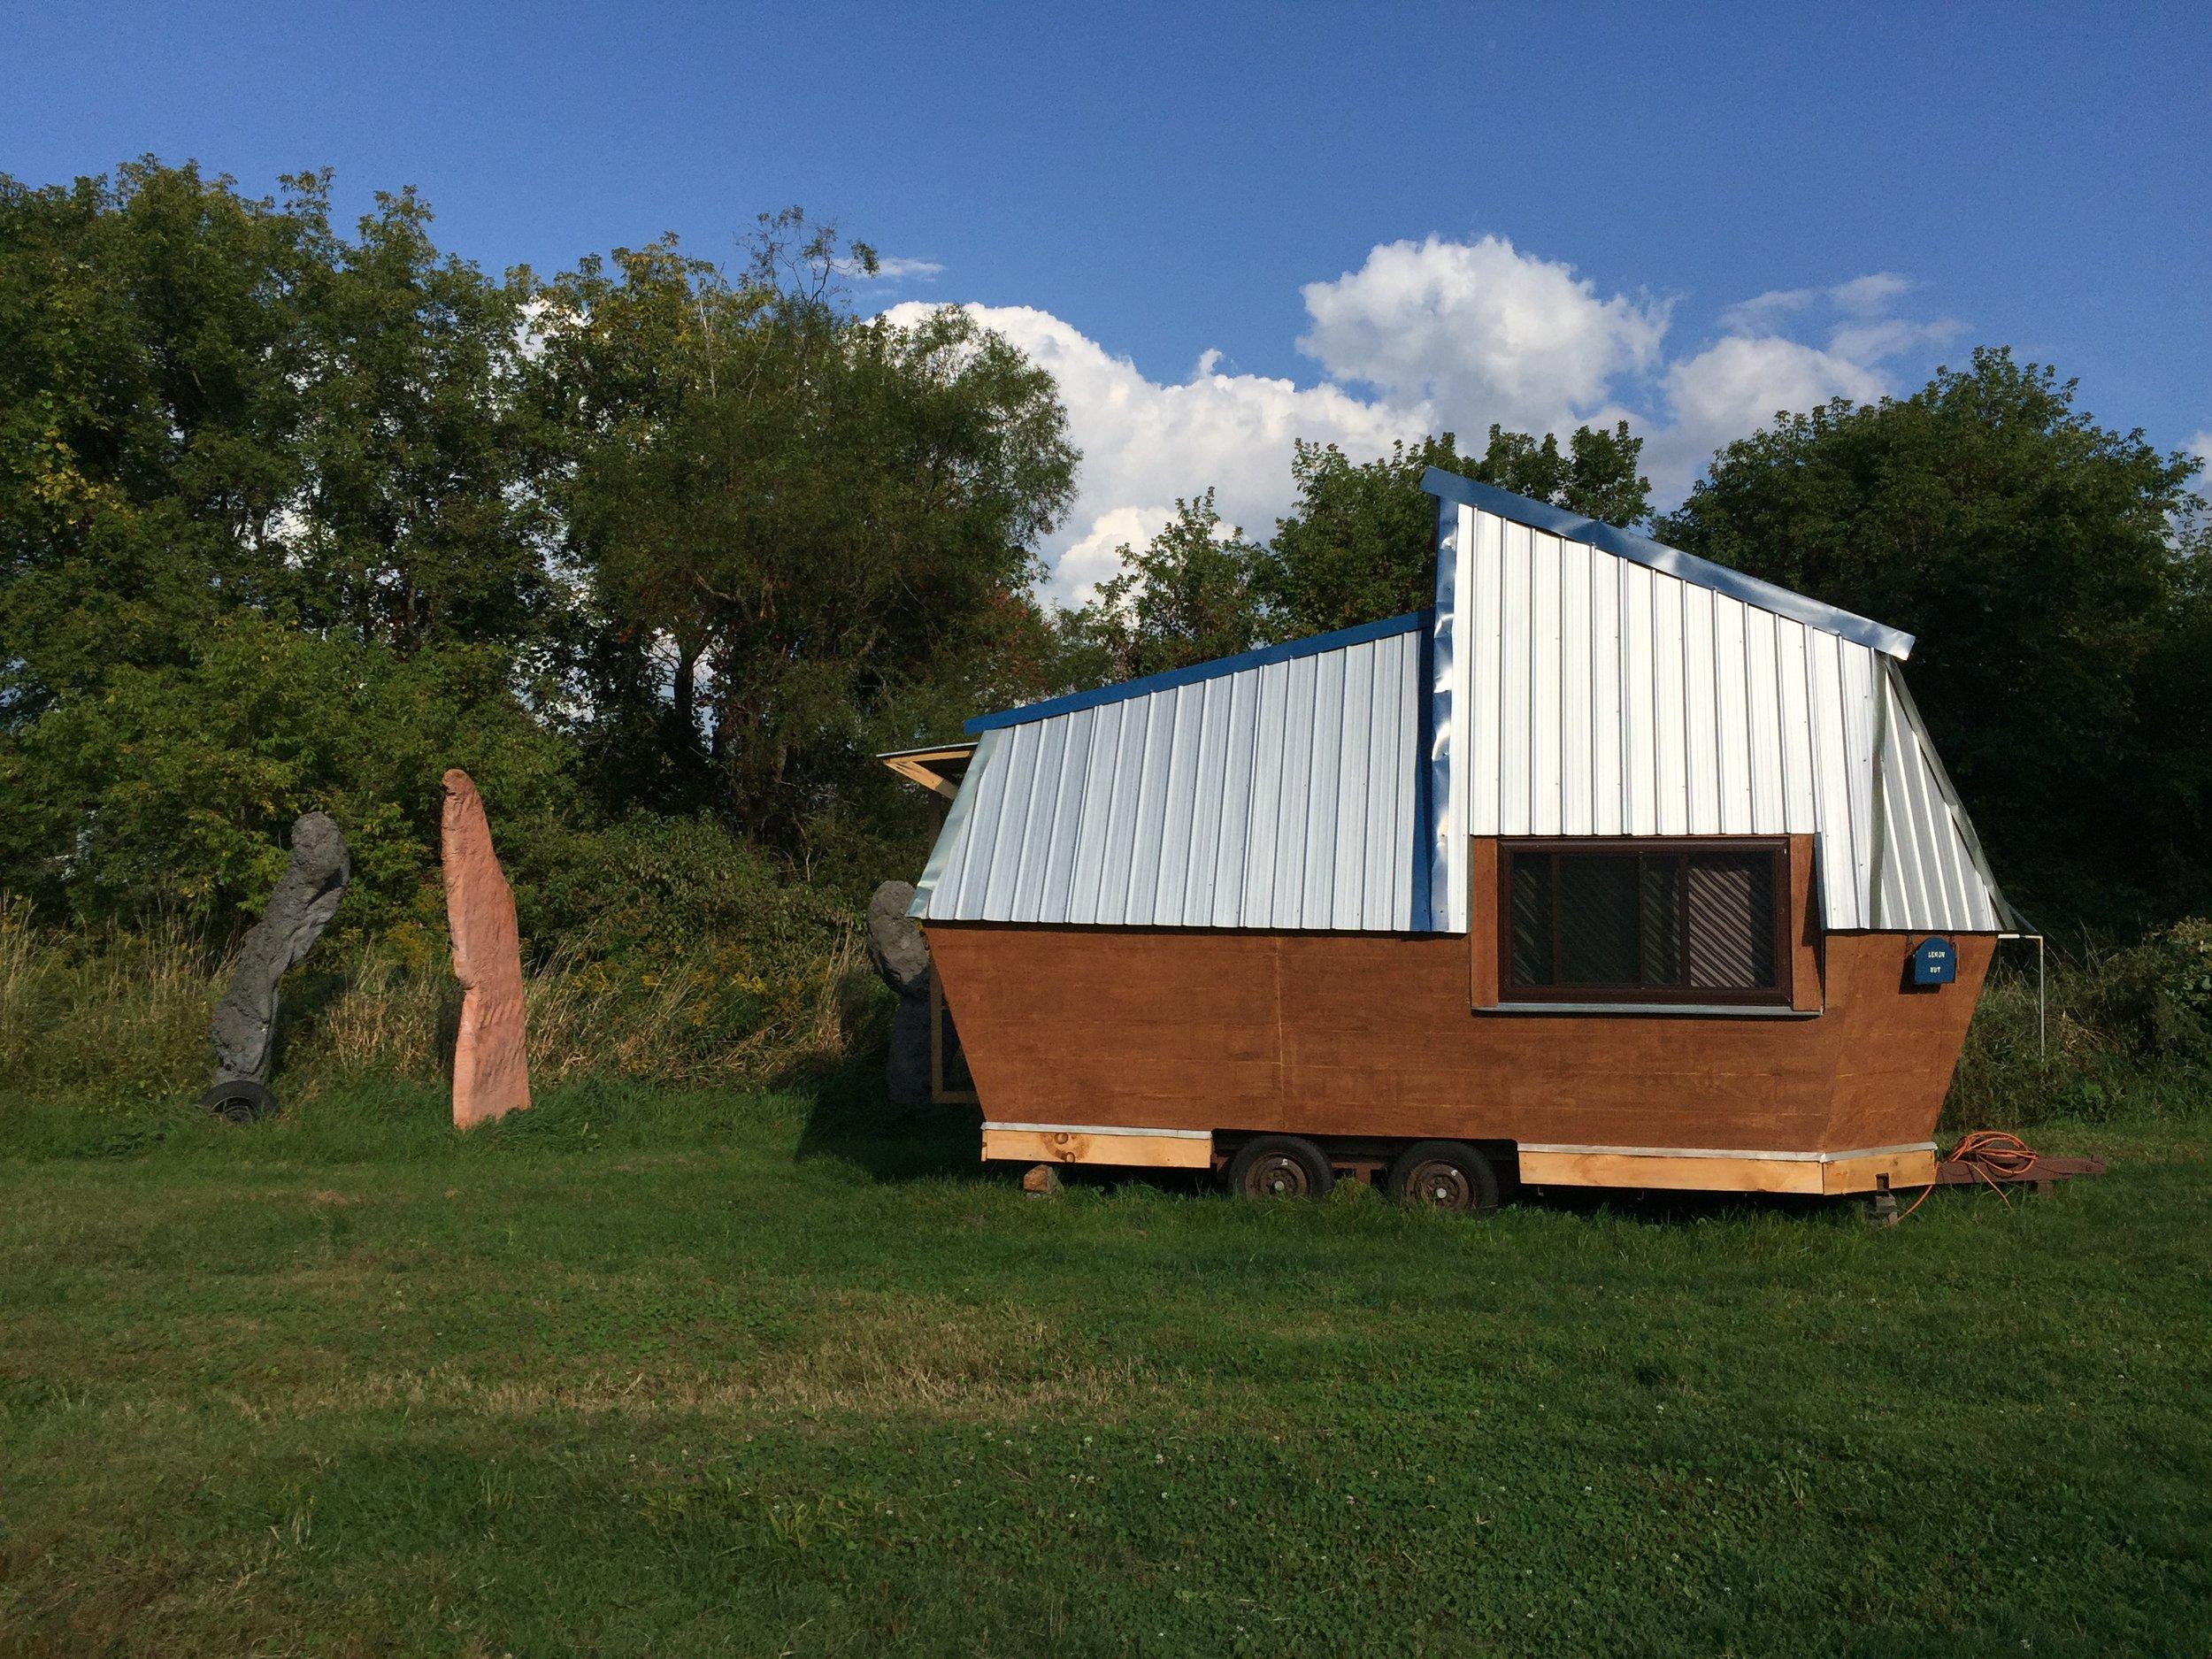 Lemon Hut arthouse by Chelsea Thew and Derek Weston